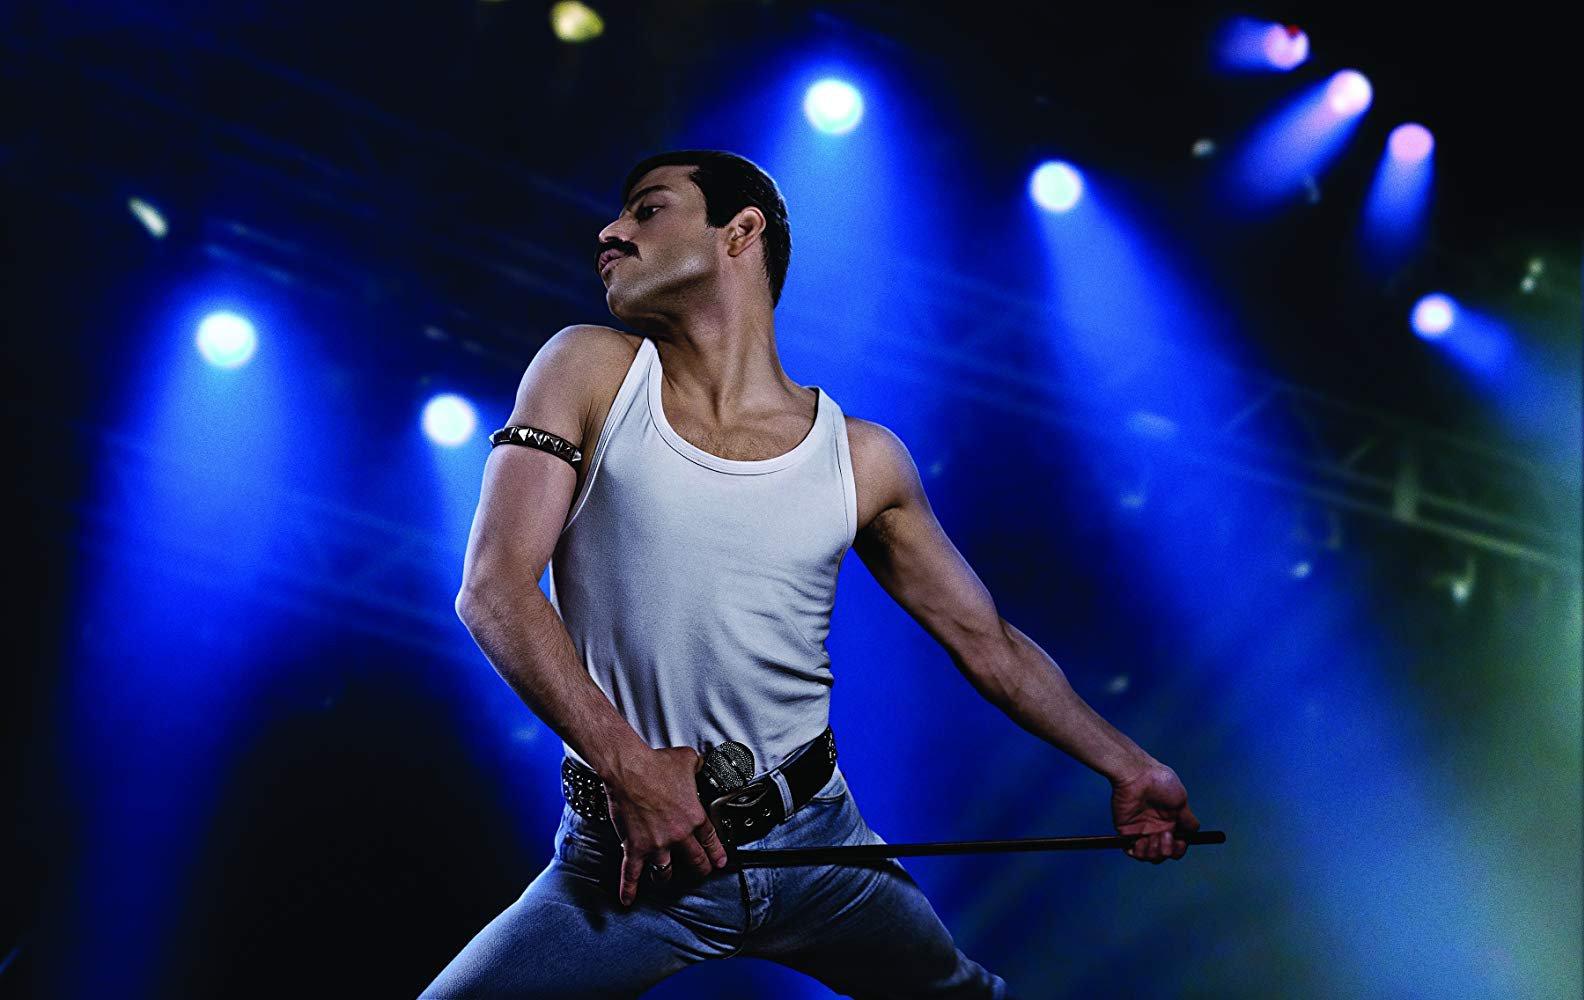 Rami Malek defends Bohemian Rhapsody for not showing 'entire Freddie Mercury story'